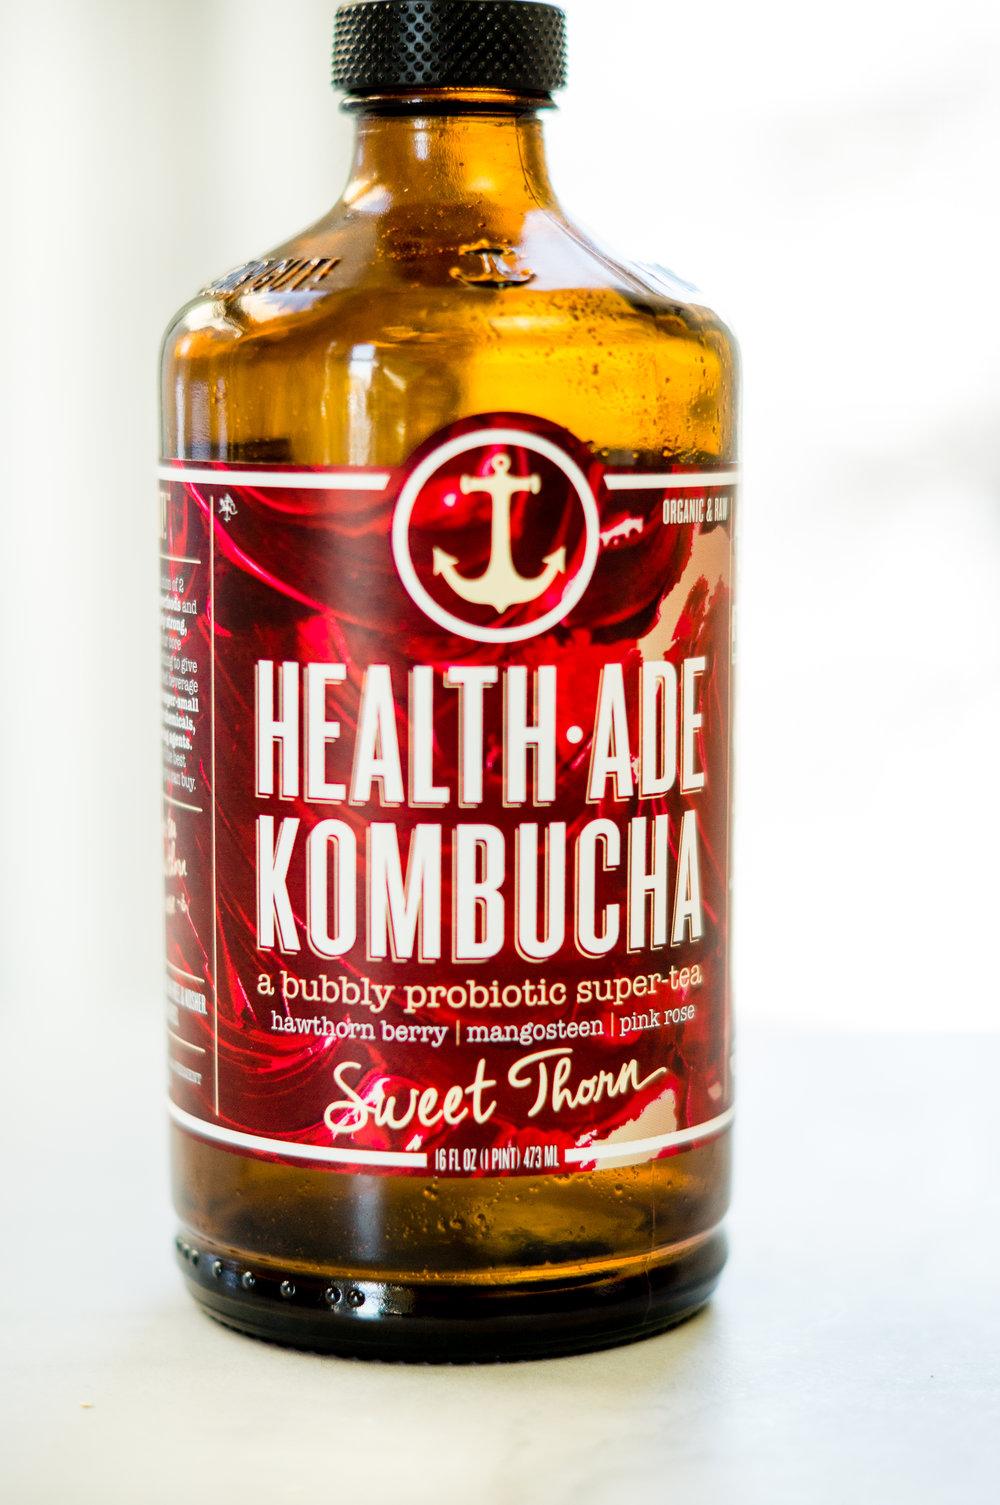 health-ade kombucha, kombucha, the best kombucha, the best kombucha that actually tastes good, is health-ade kombucha good, what is kombucha, what are the health benefits of drinking kombucha, does kombucha help digestion, how can i improve my digestion, what's in kombucha, what does kombucha taste like, what's the best kombucha brand, where can i buy kombucha, is kombucha good for you, can kombucha help you lose weight, i am rorie kombucha review, i am rorie health-ade kombucha review, health-ade kombucha review